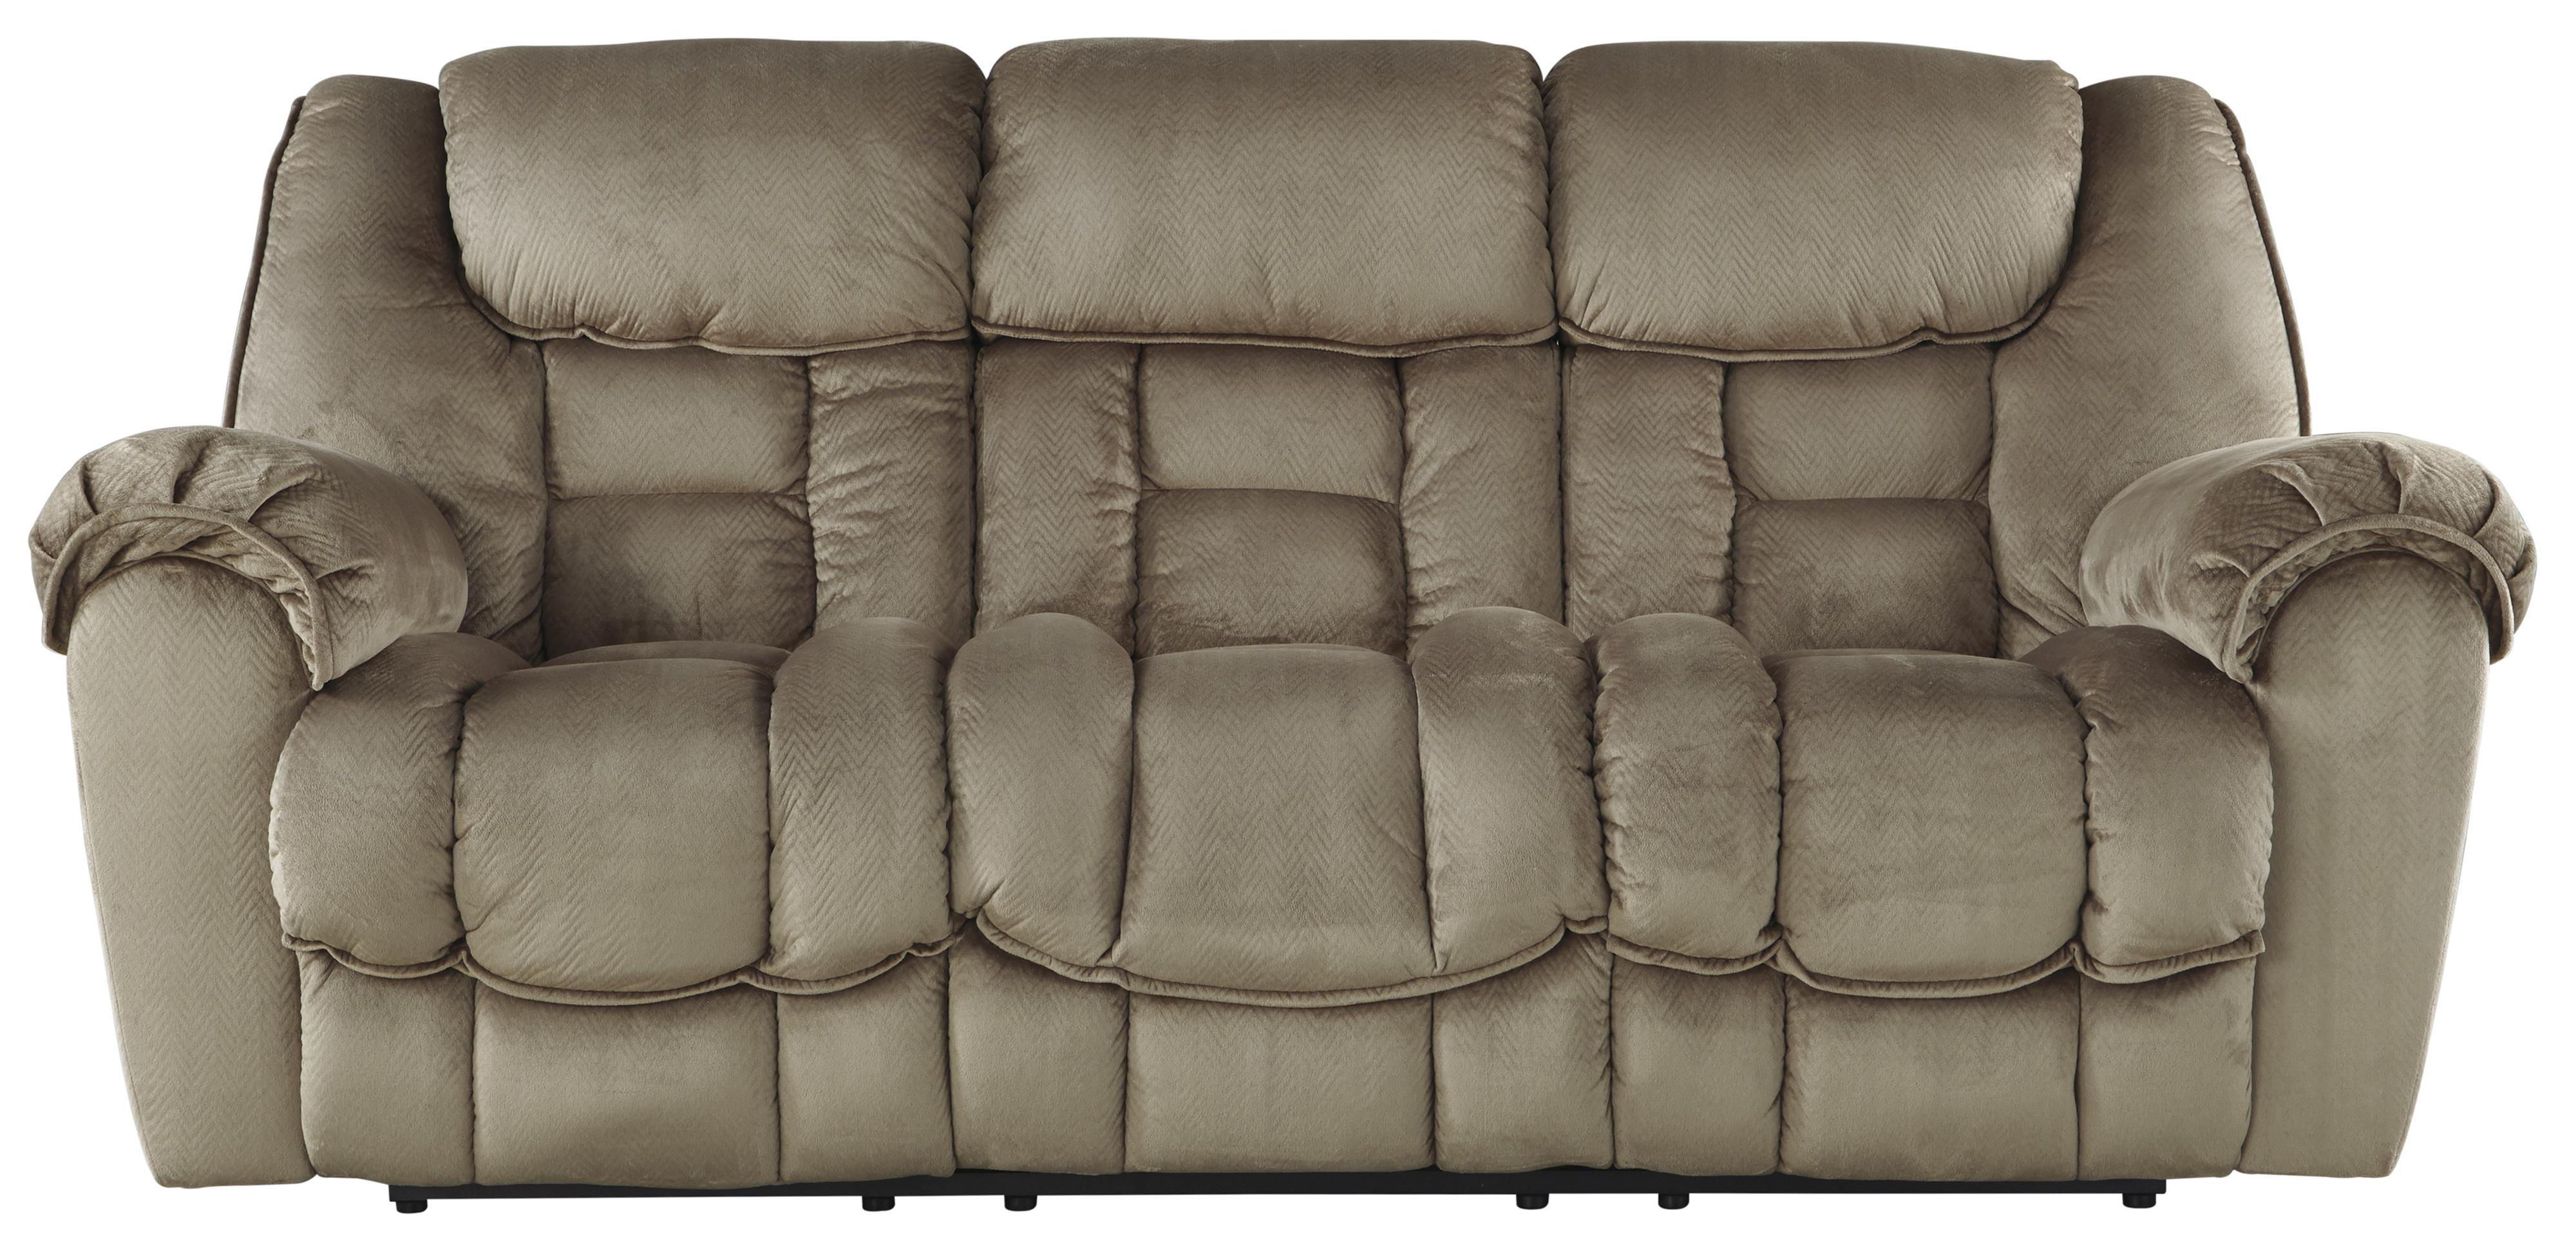 Benchcraft Jodoca Reclining Power Sofa - Item Number: 3660187